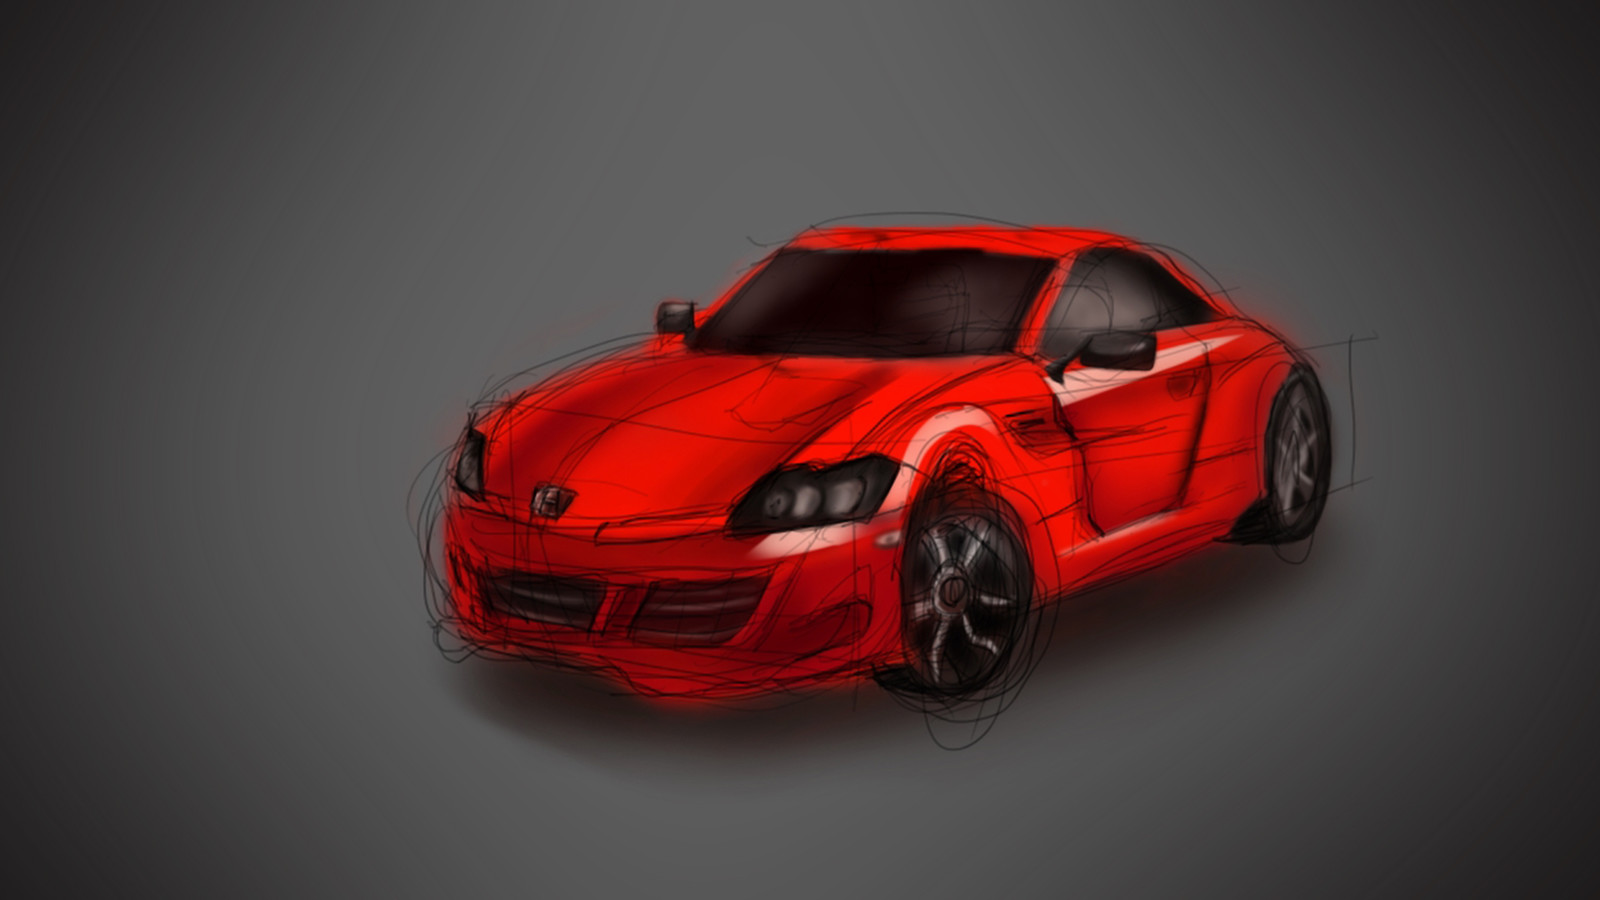 Concept of a car